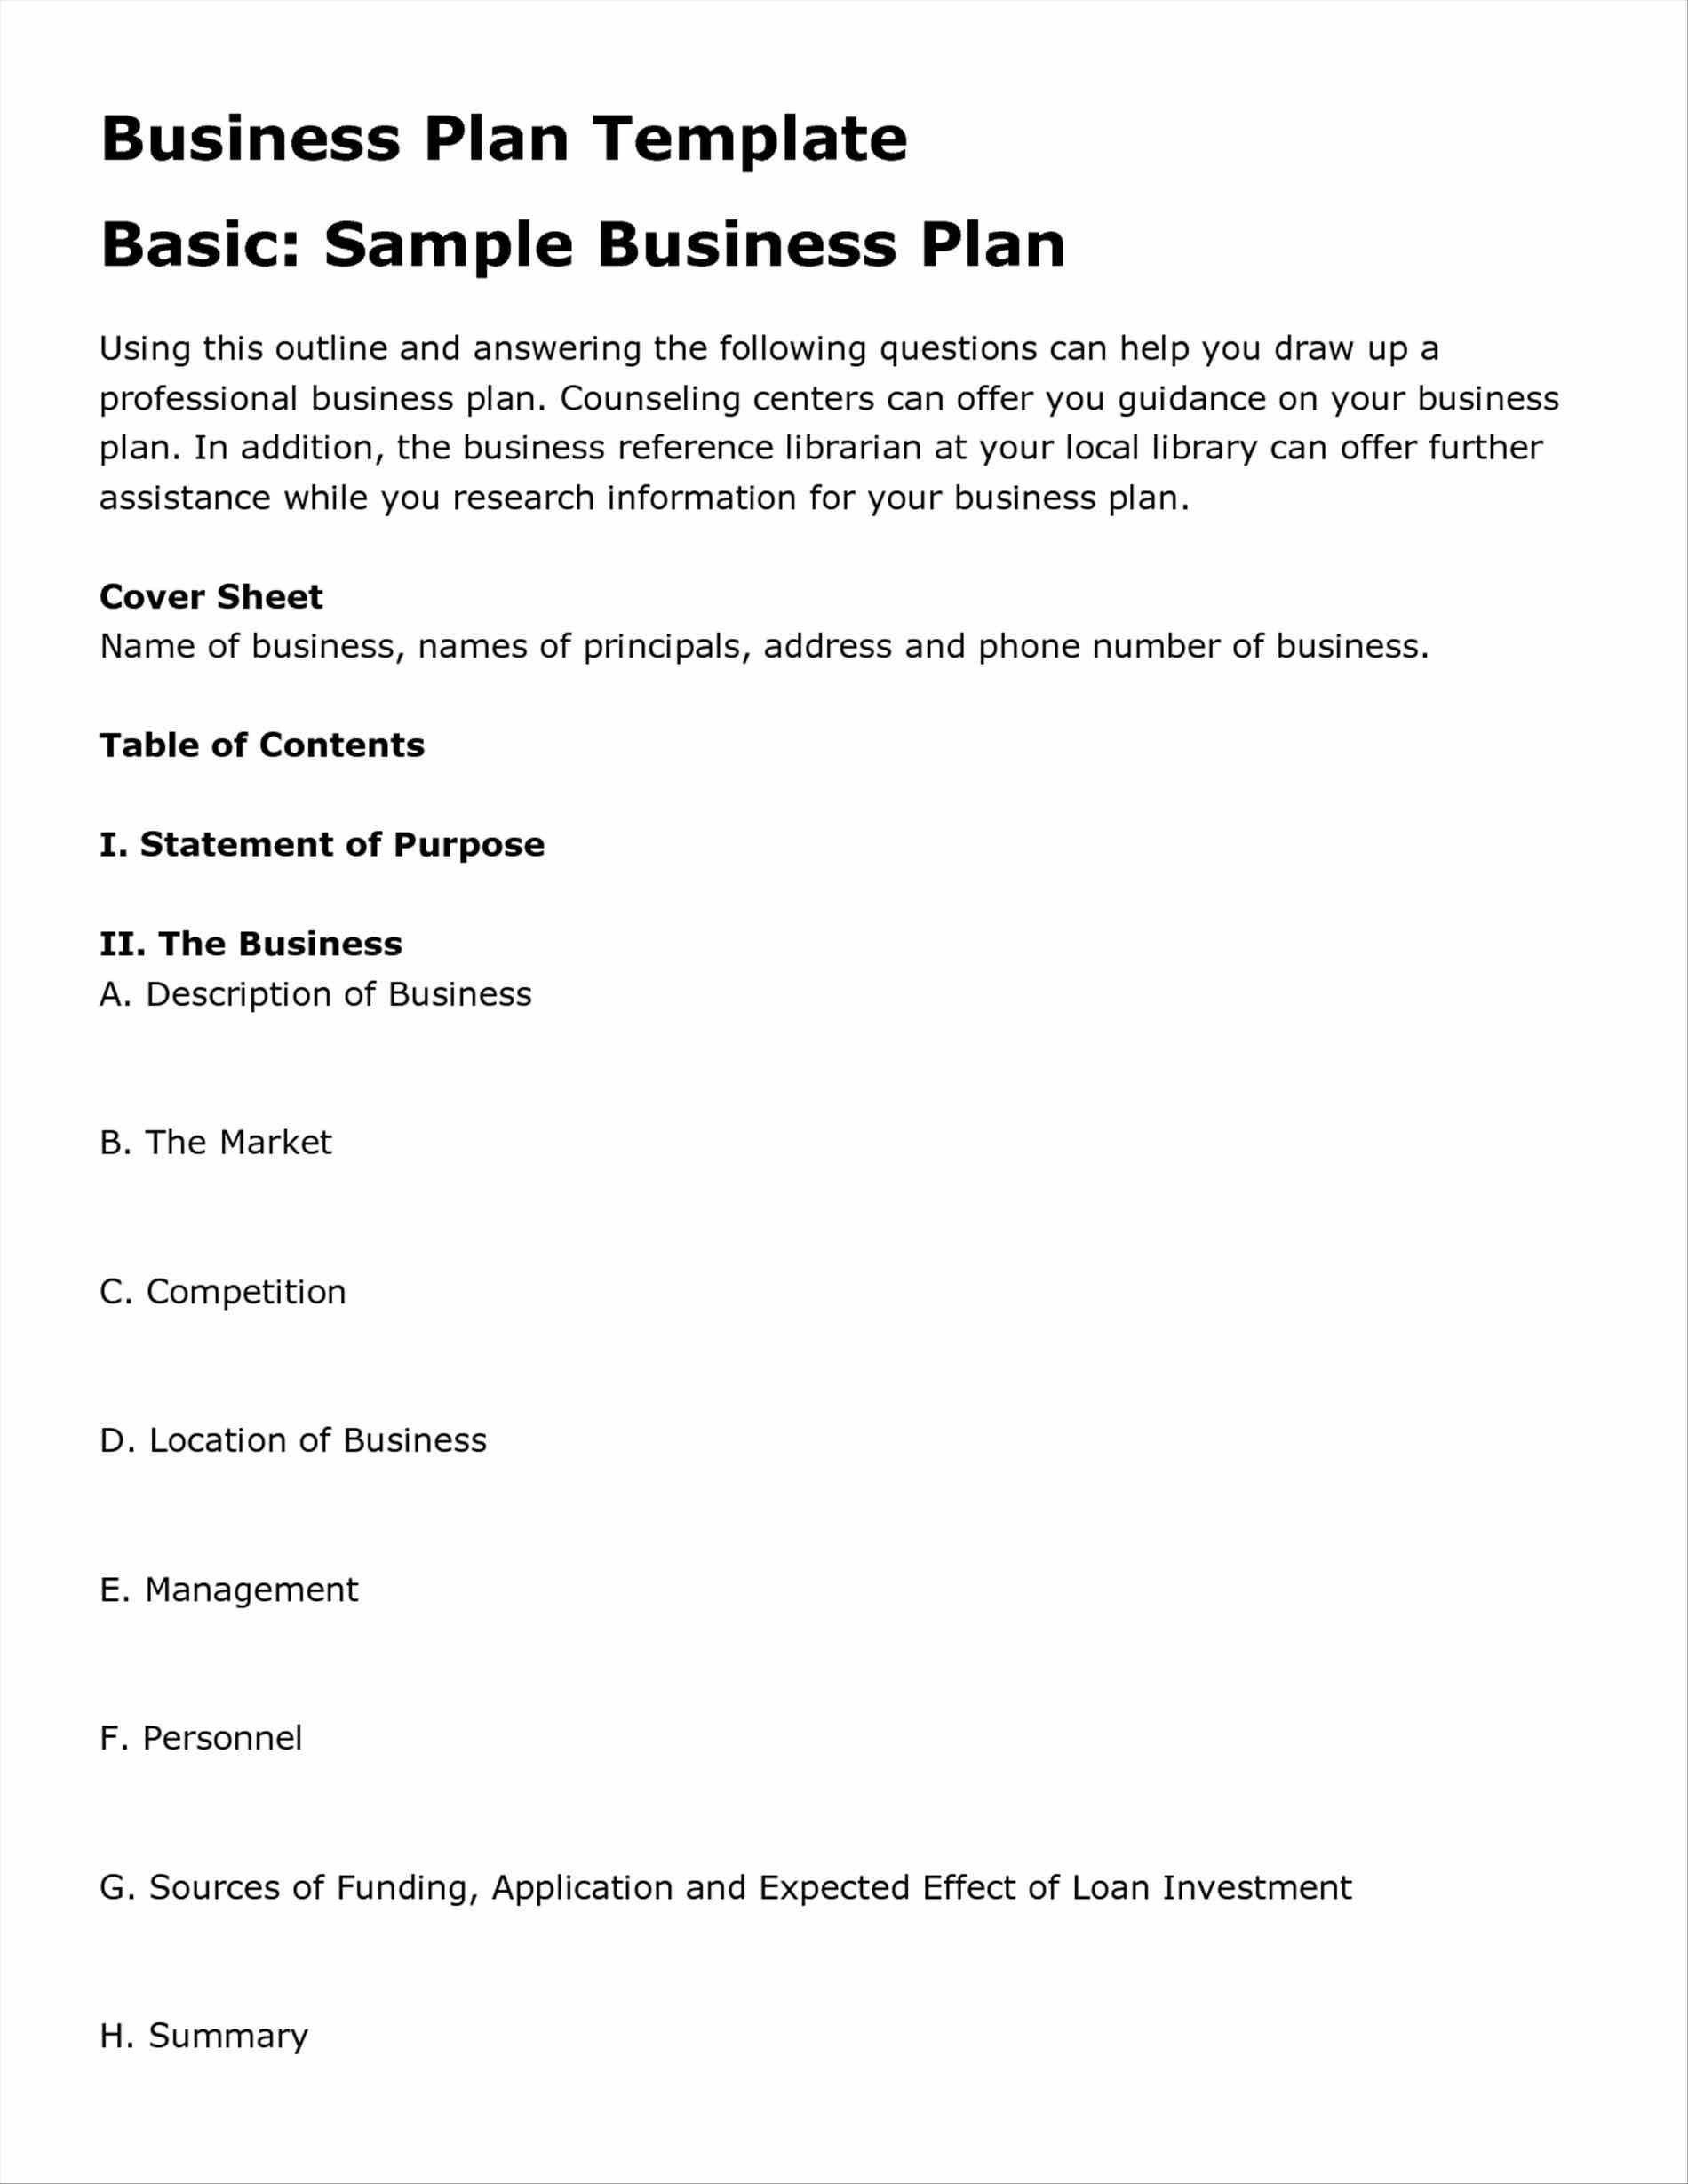 Restaurant Business Plan Sample  Monzaberglaufverband Throughout Restaurant Business Proposal Template